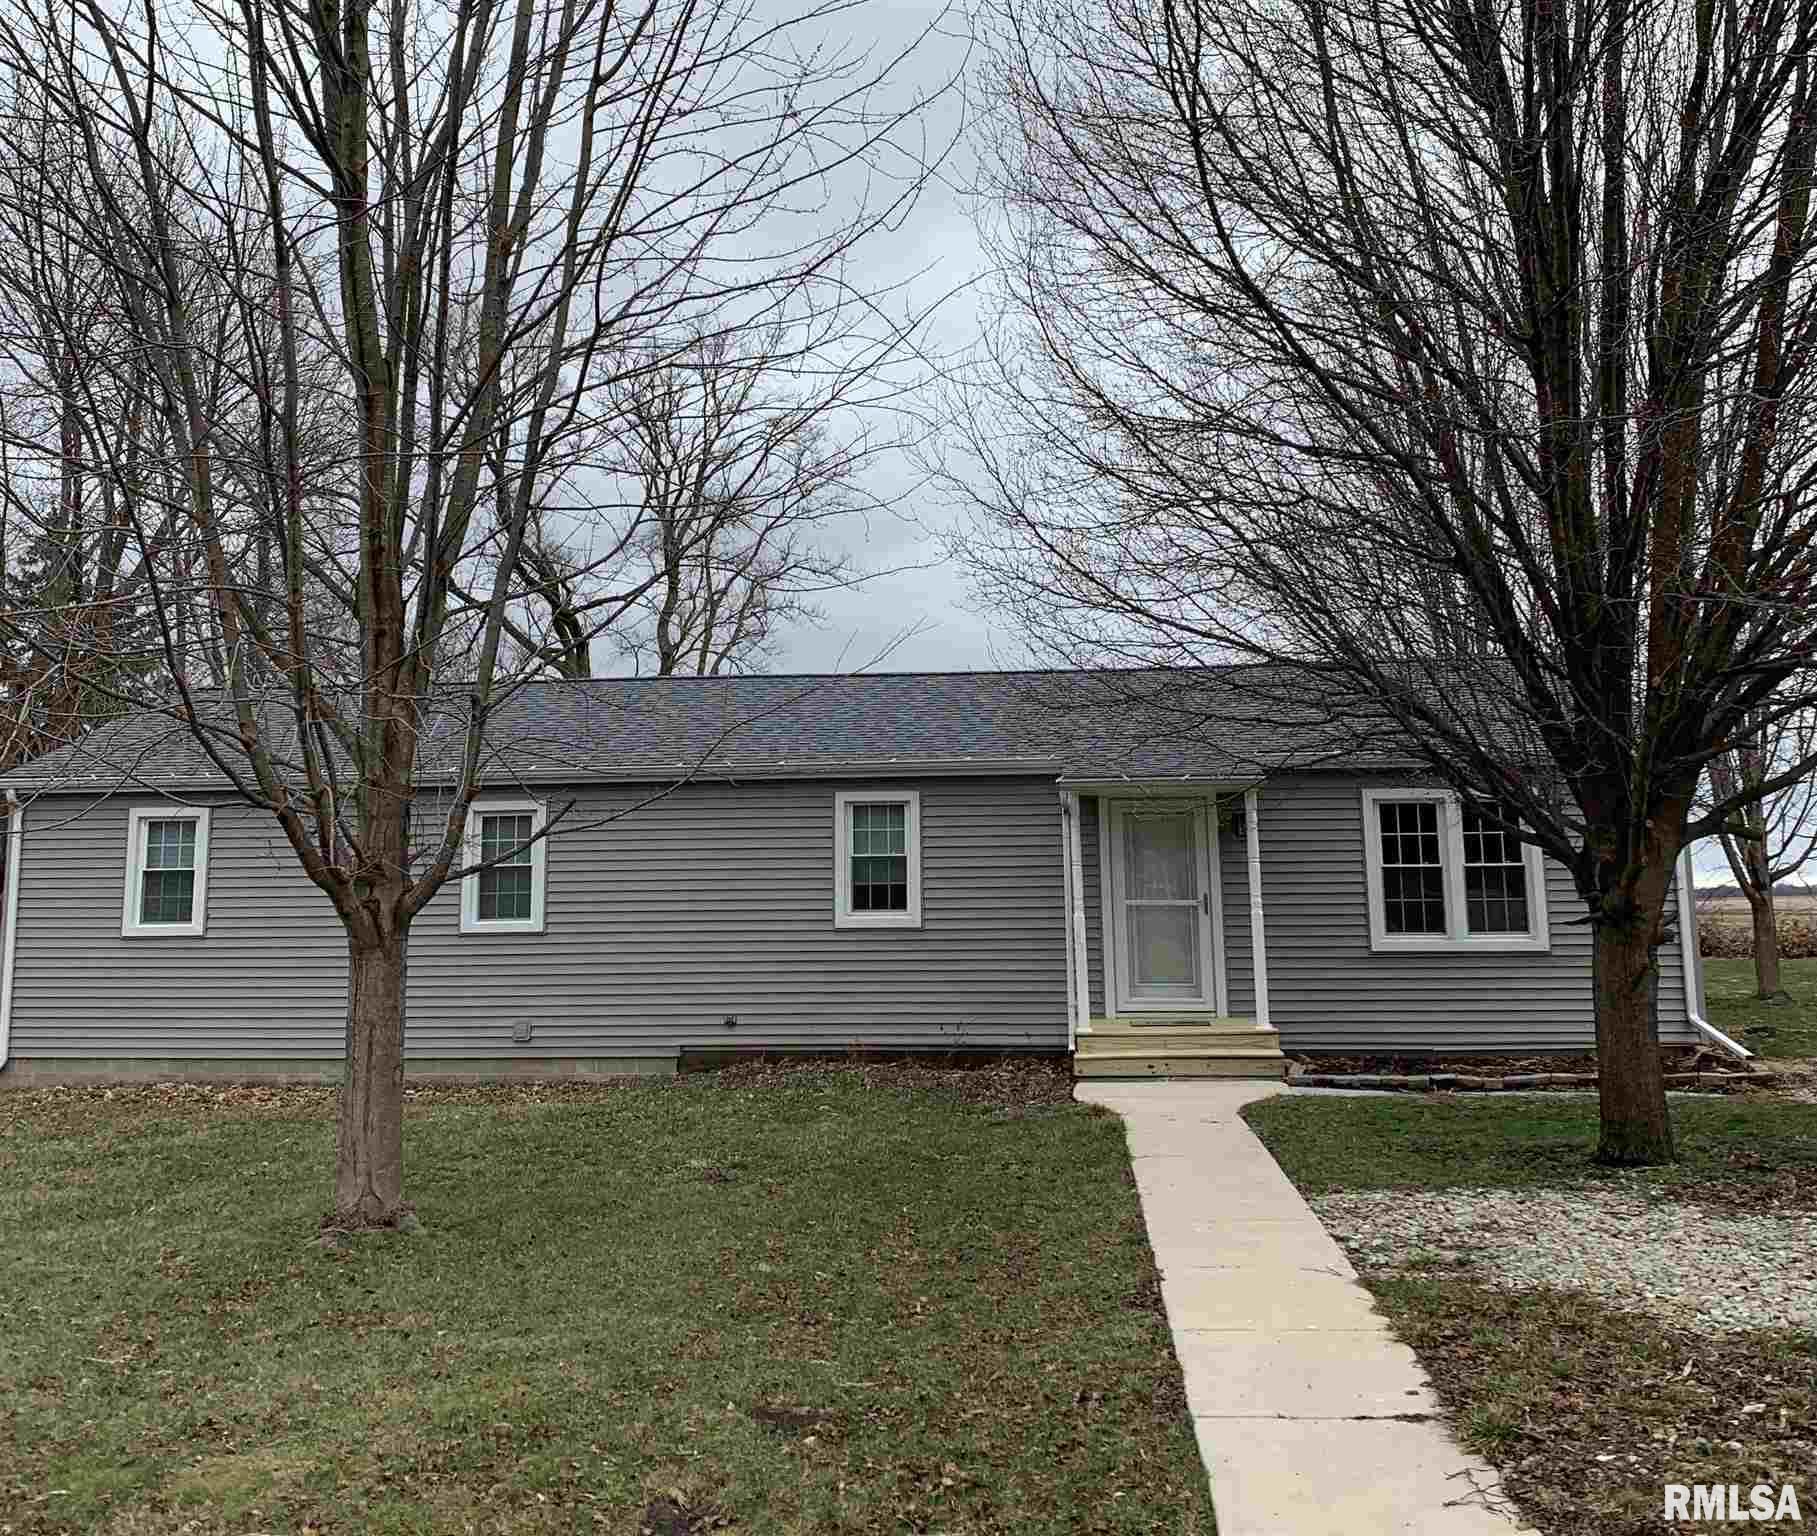 304 W FULTON Property Photo - Yates City, IL real estate listing